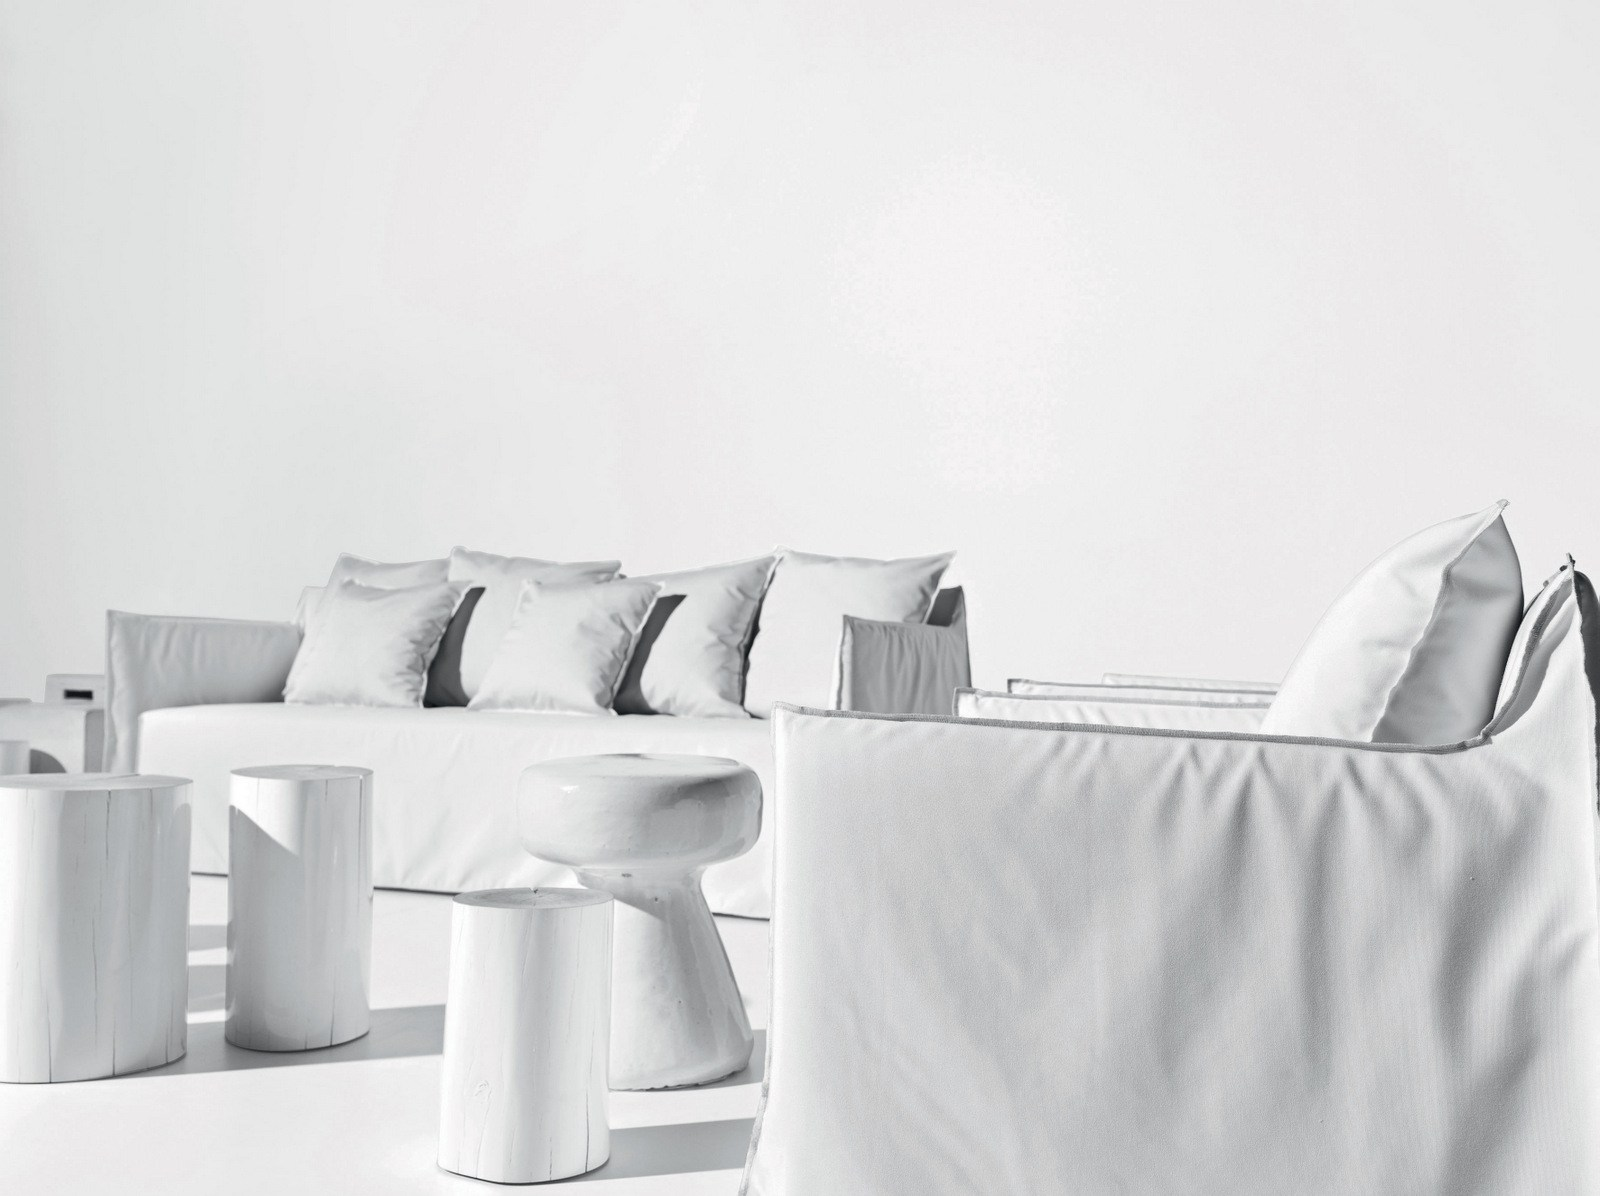 IKEA SÖDERHAMN/ソーデルハムンをゴースト・ソファに大改造 part 1:コンセプト